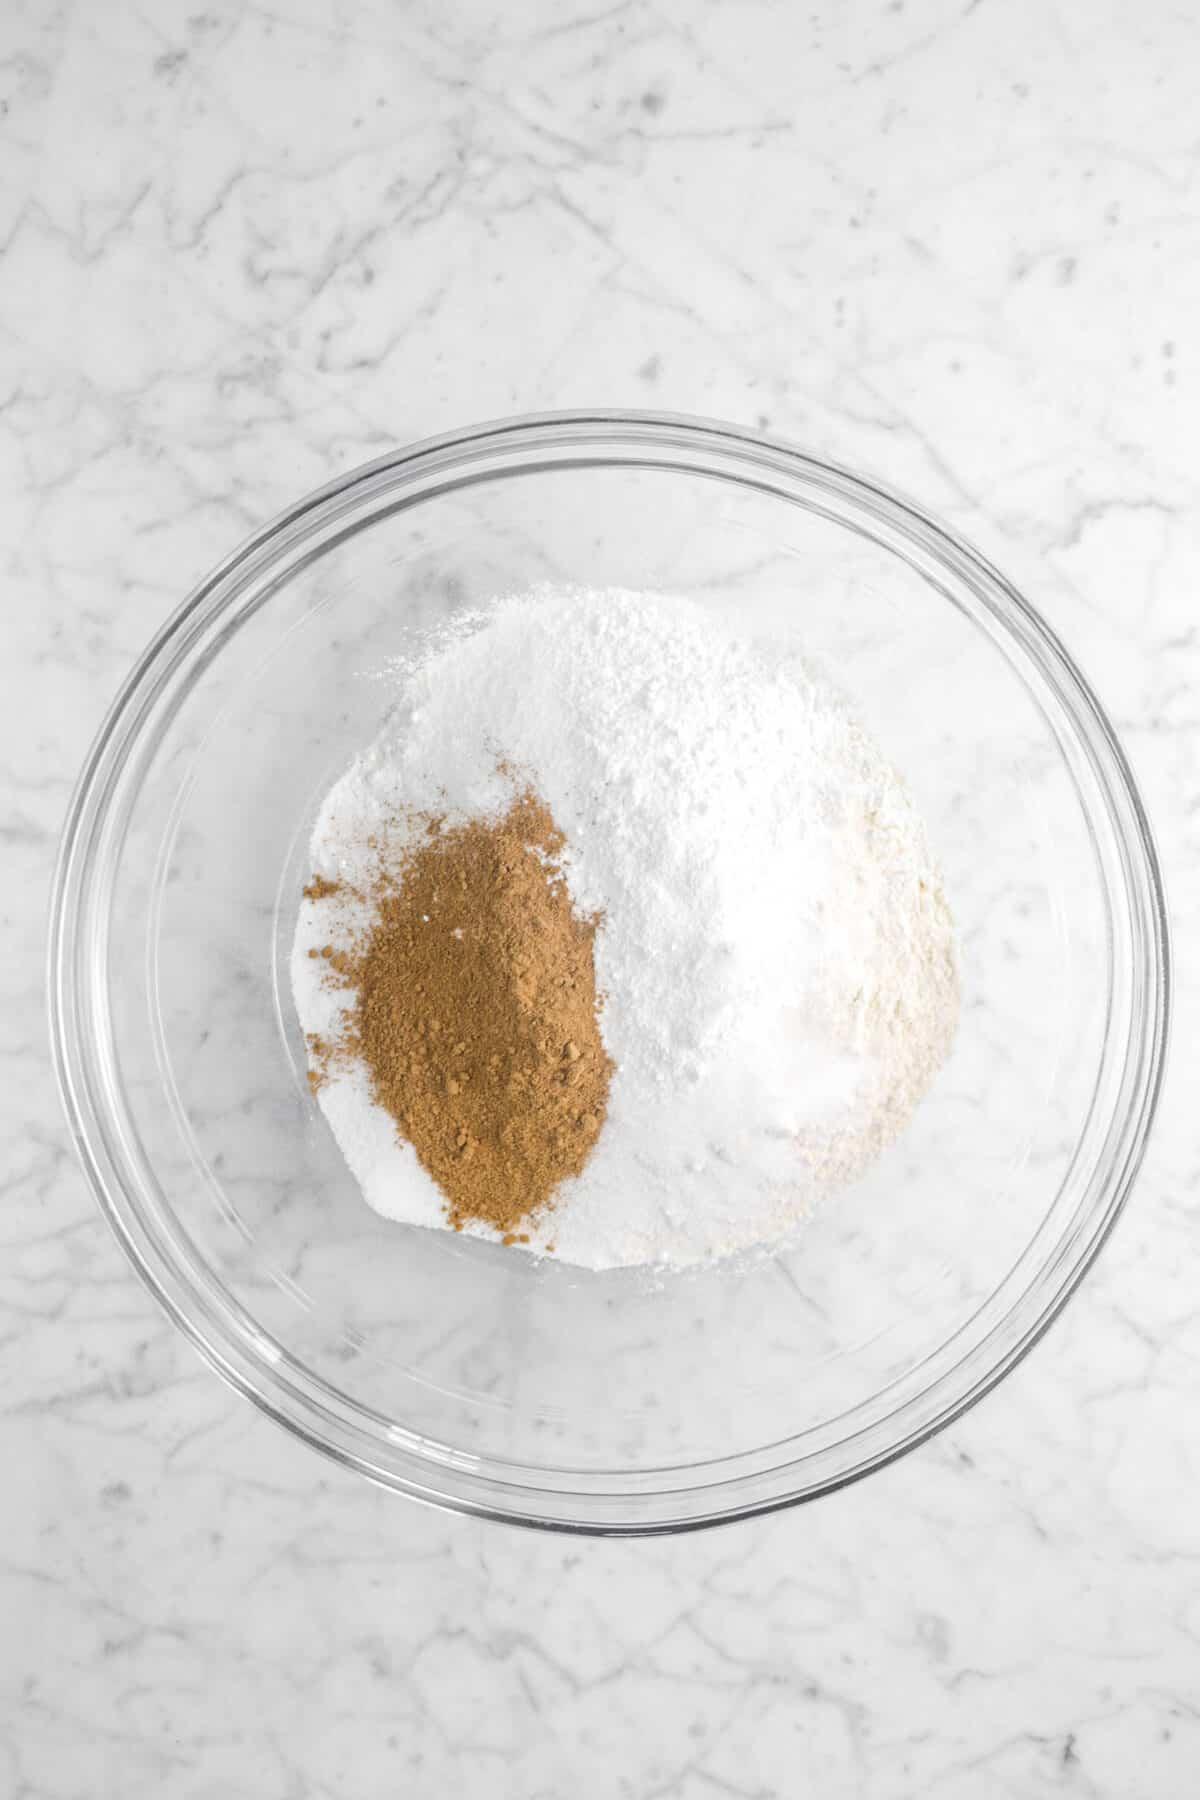 flour, salt, sugar, baking powder, and pumpkin pie spice in glass bowl